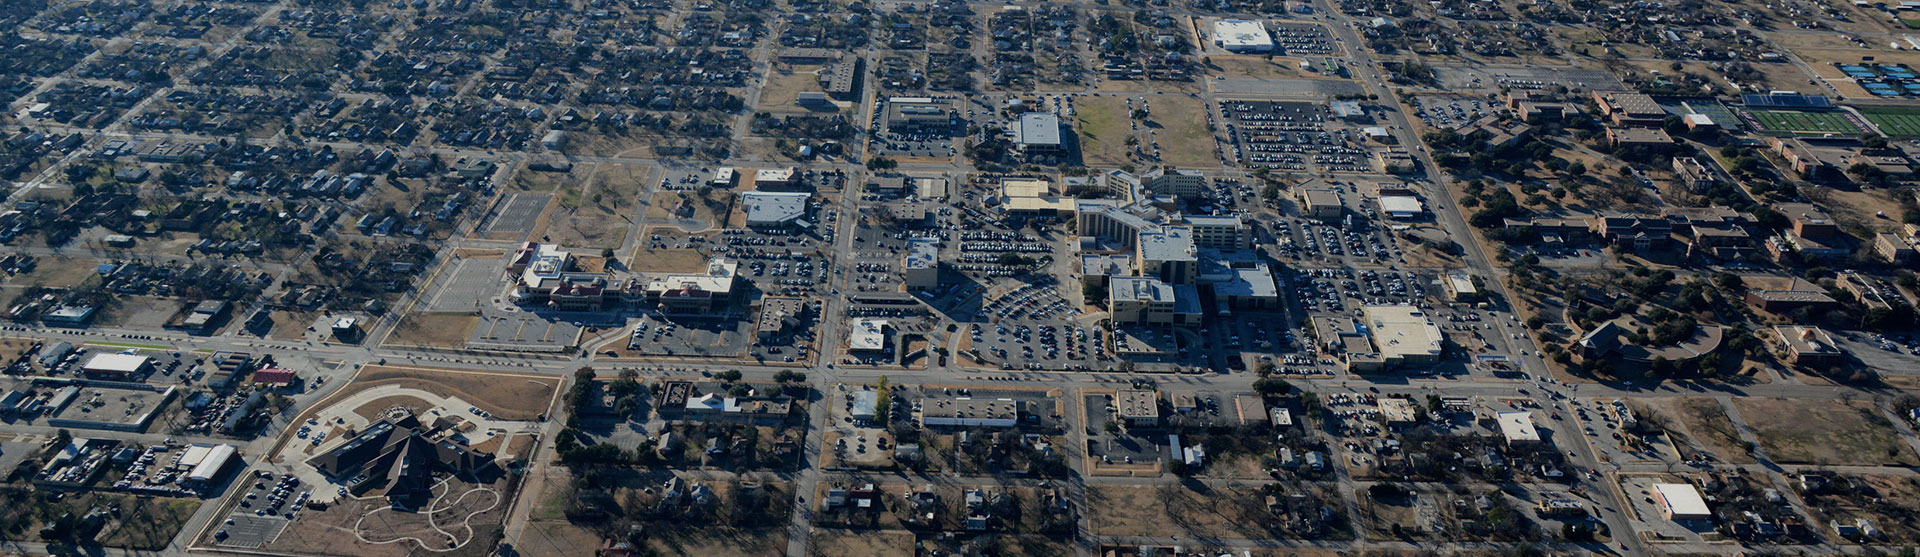 Hendrick Medical Campus, Abilene, TX